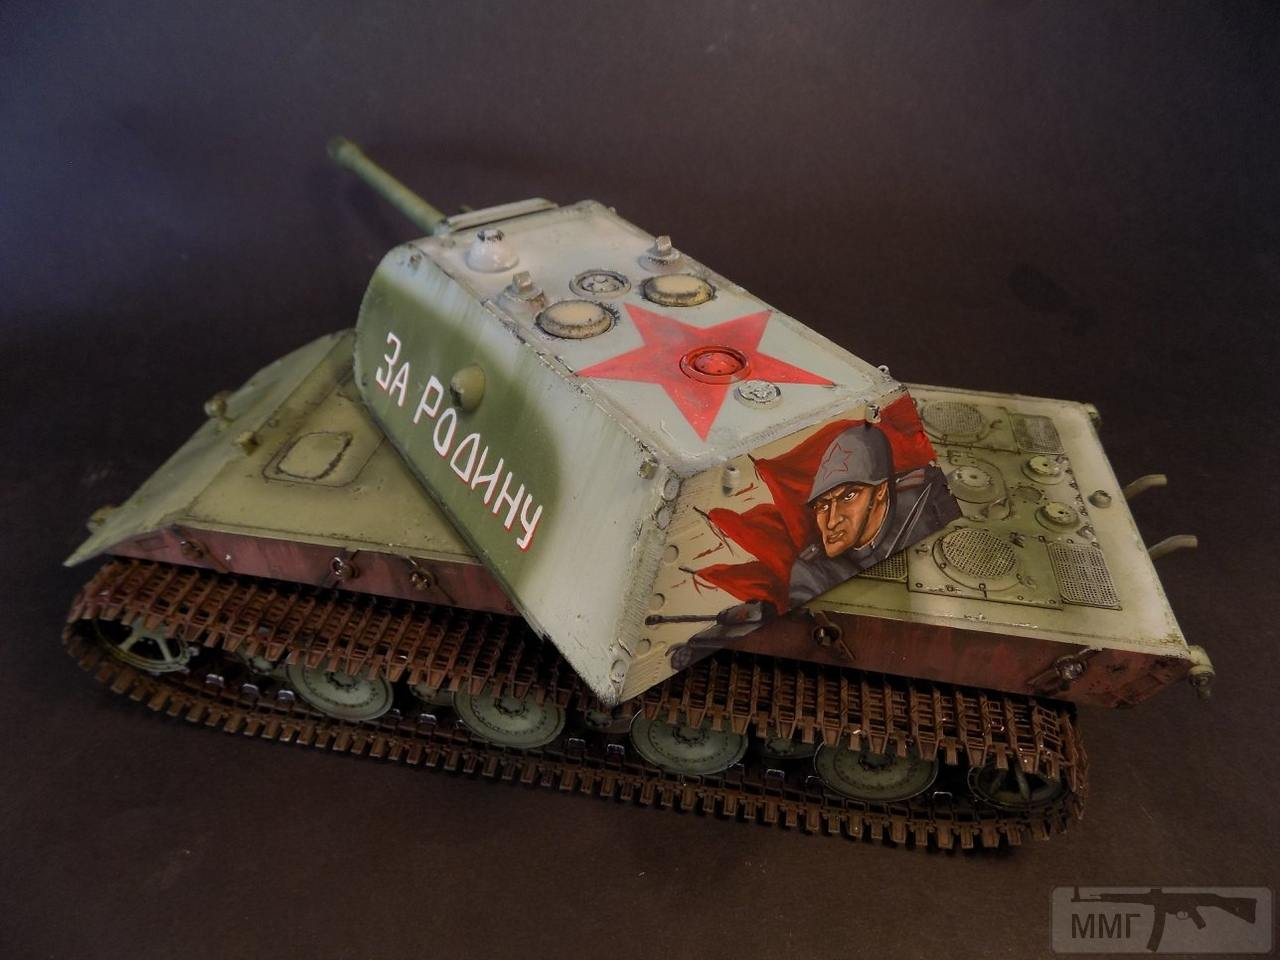 38327 - Модели бронетехники